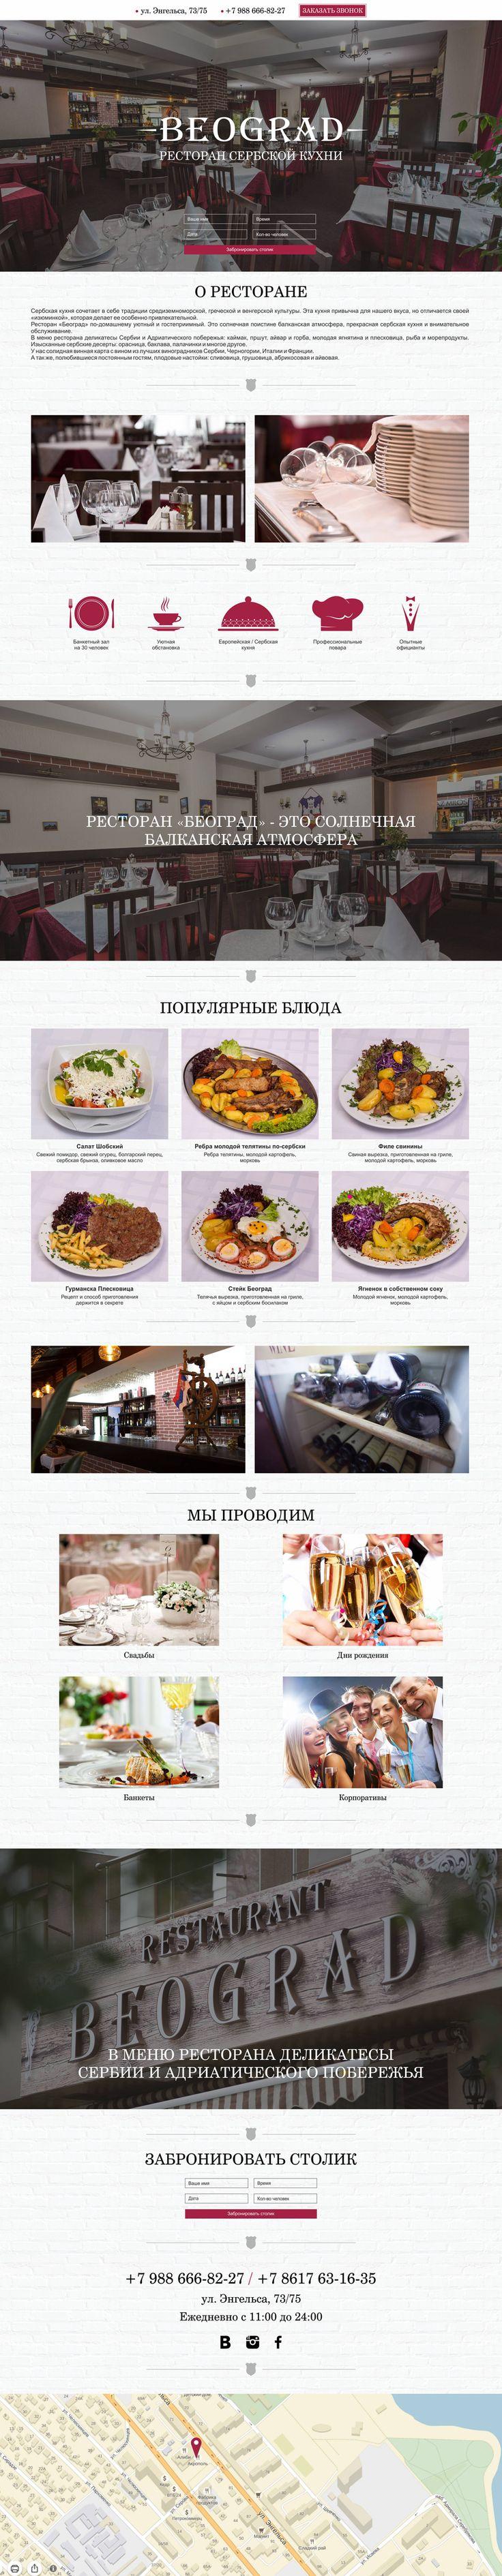 Landing page for the restaurant Serbian kitchen Beograd. Разработка landing page для ресторана сербской кухни Београд.